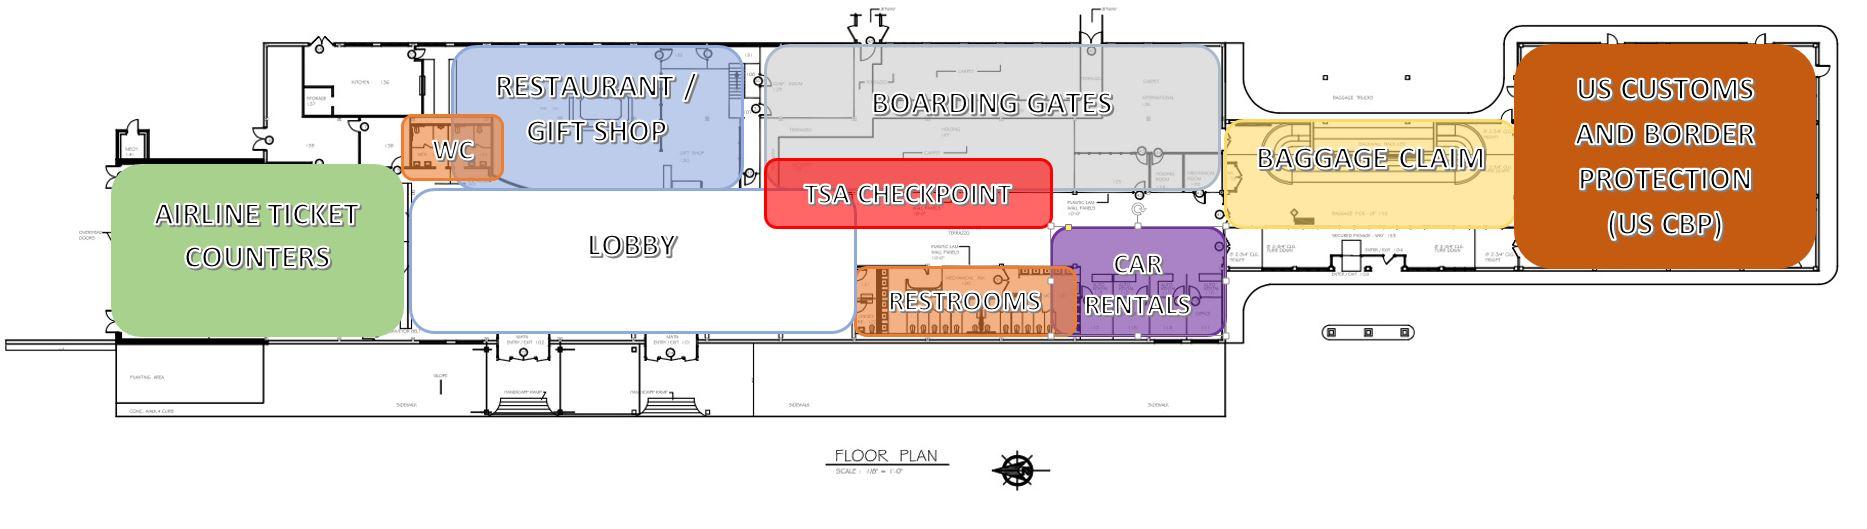 hight resolution of passenger terminal